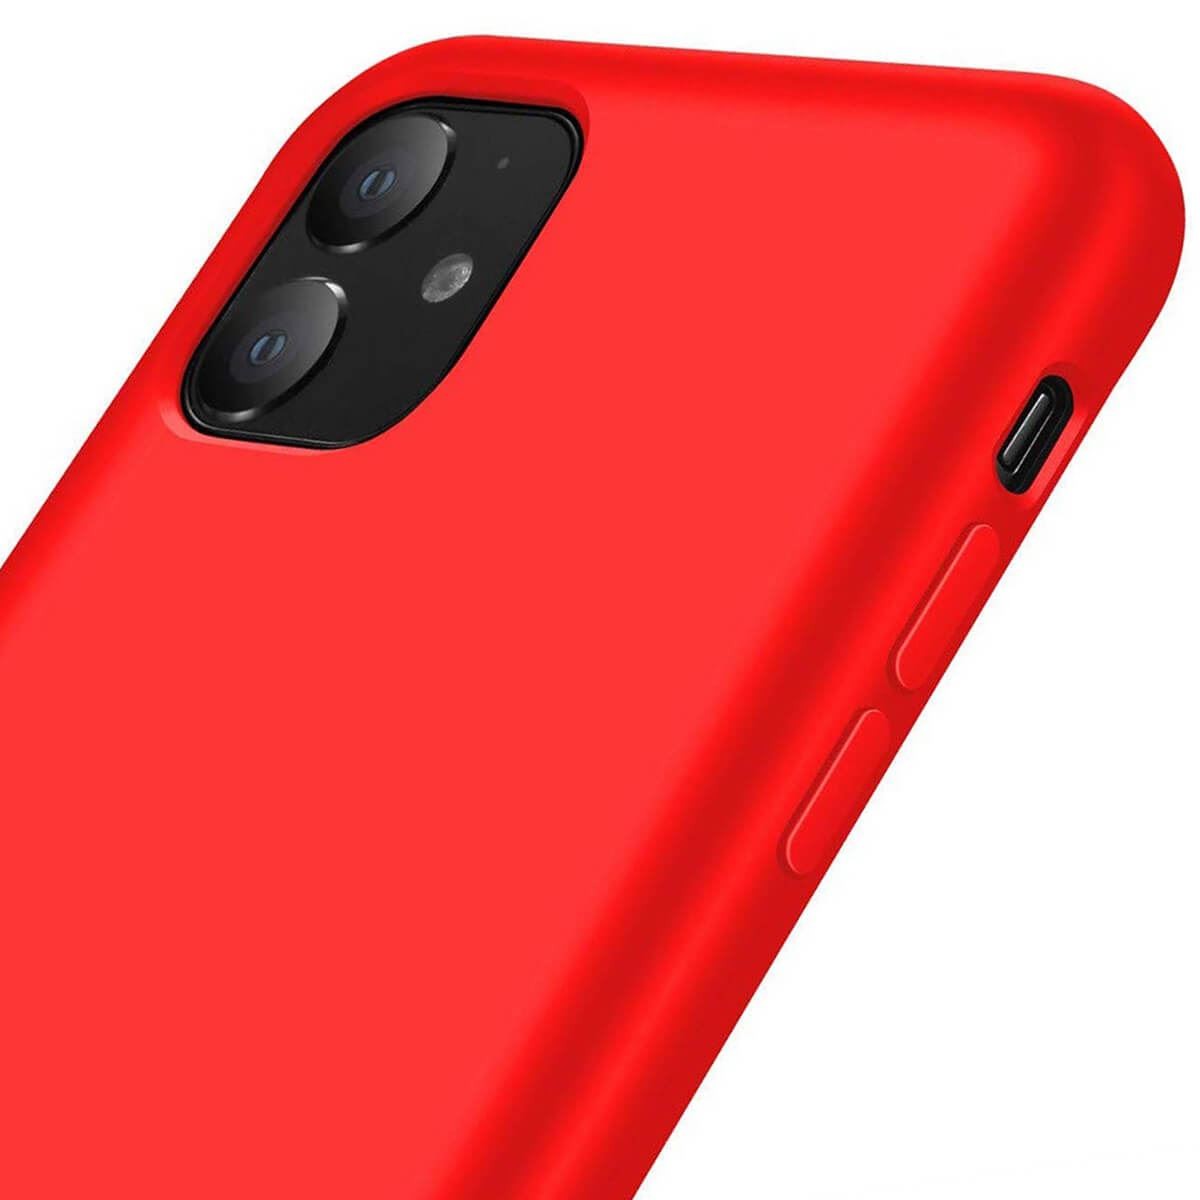 Leather-Slim-Case-Apple-iPhone-10-8-7-Plus-6s-5-Original-PU-Soft-Silicone-Cover thumbnail 25